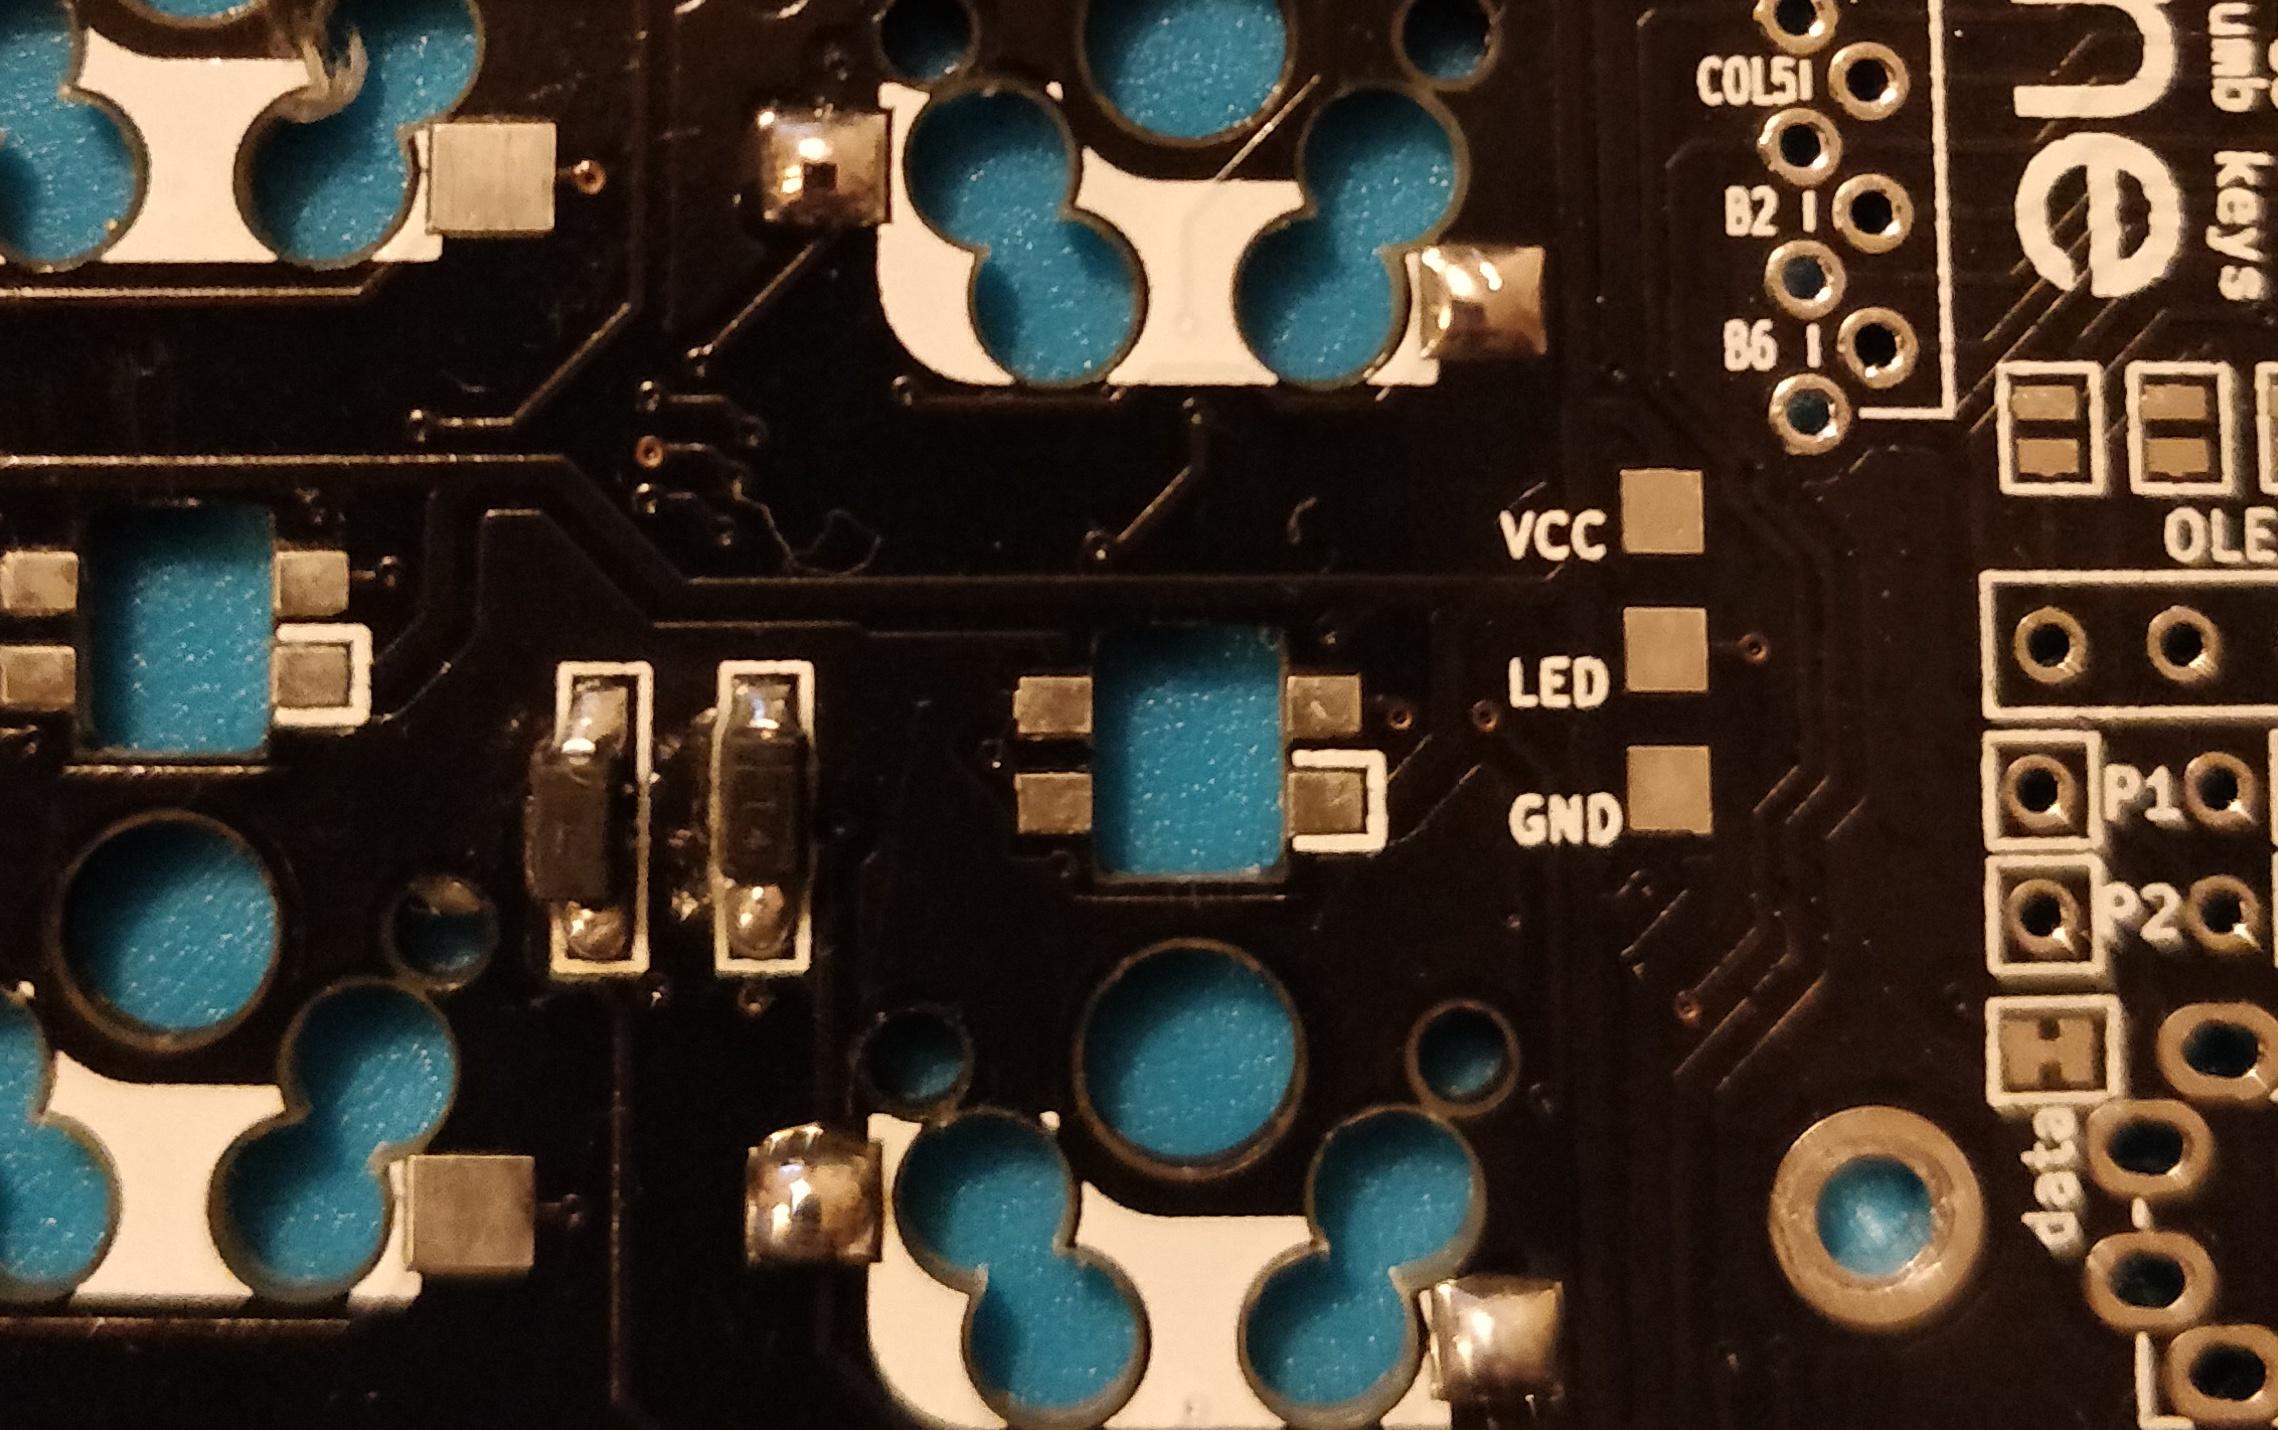 step 3 - corne crkbd - solder hotswap pads